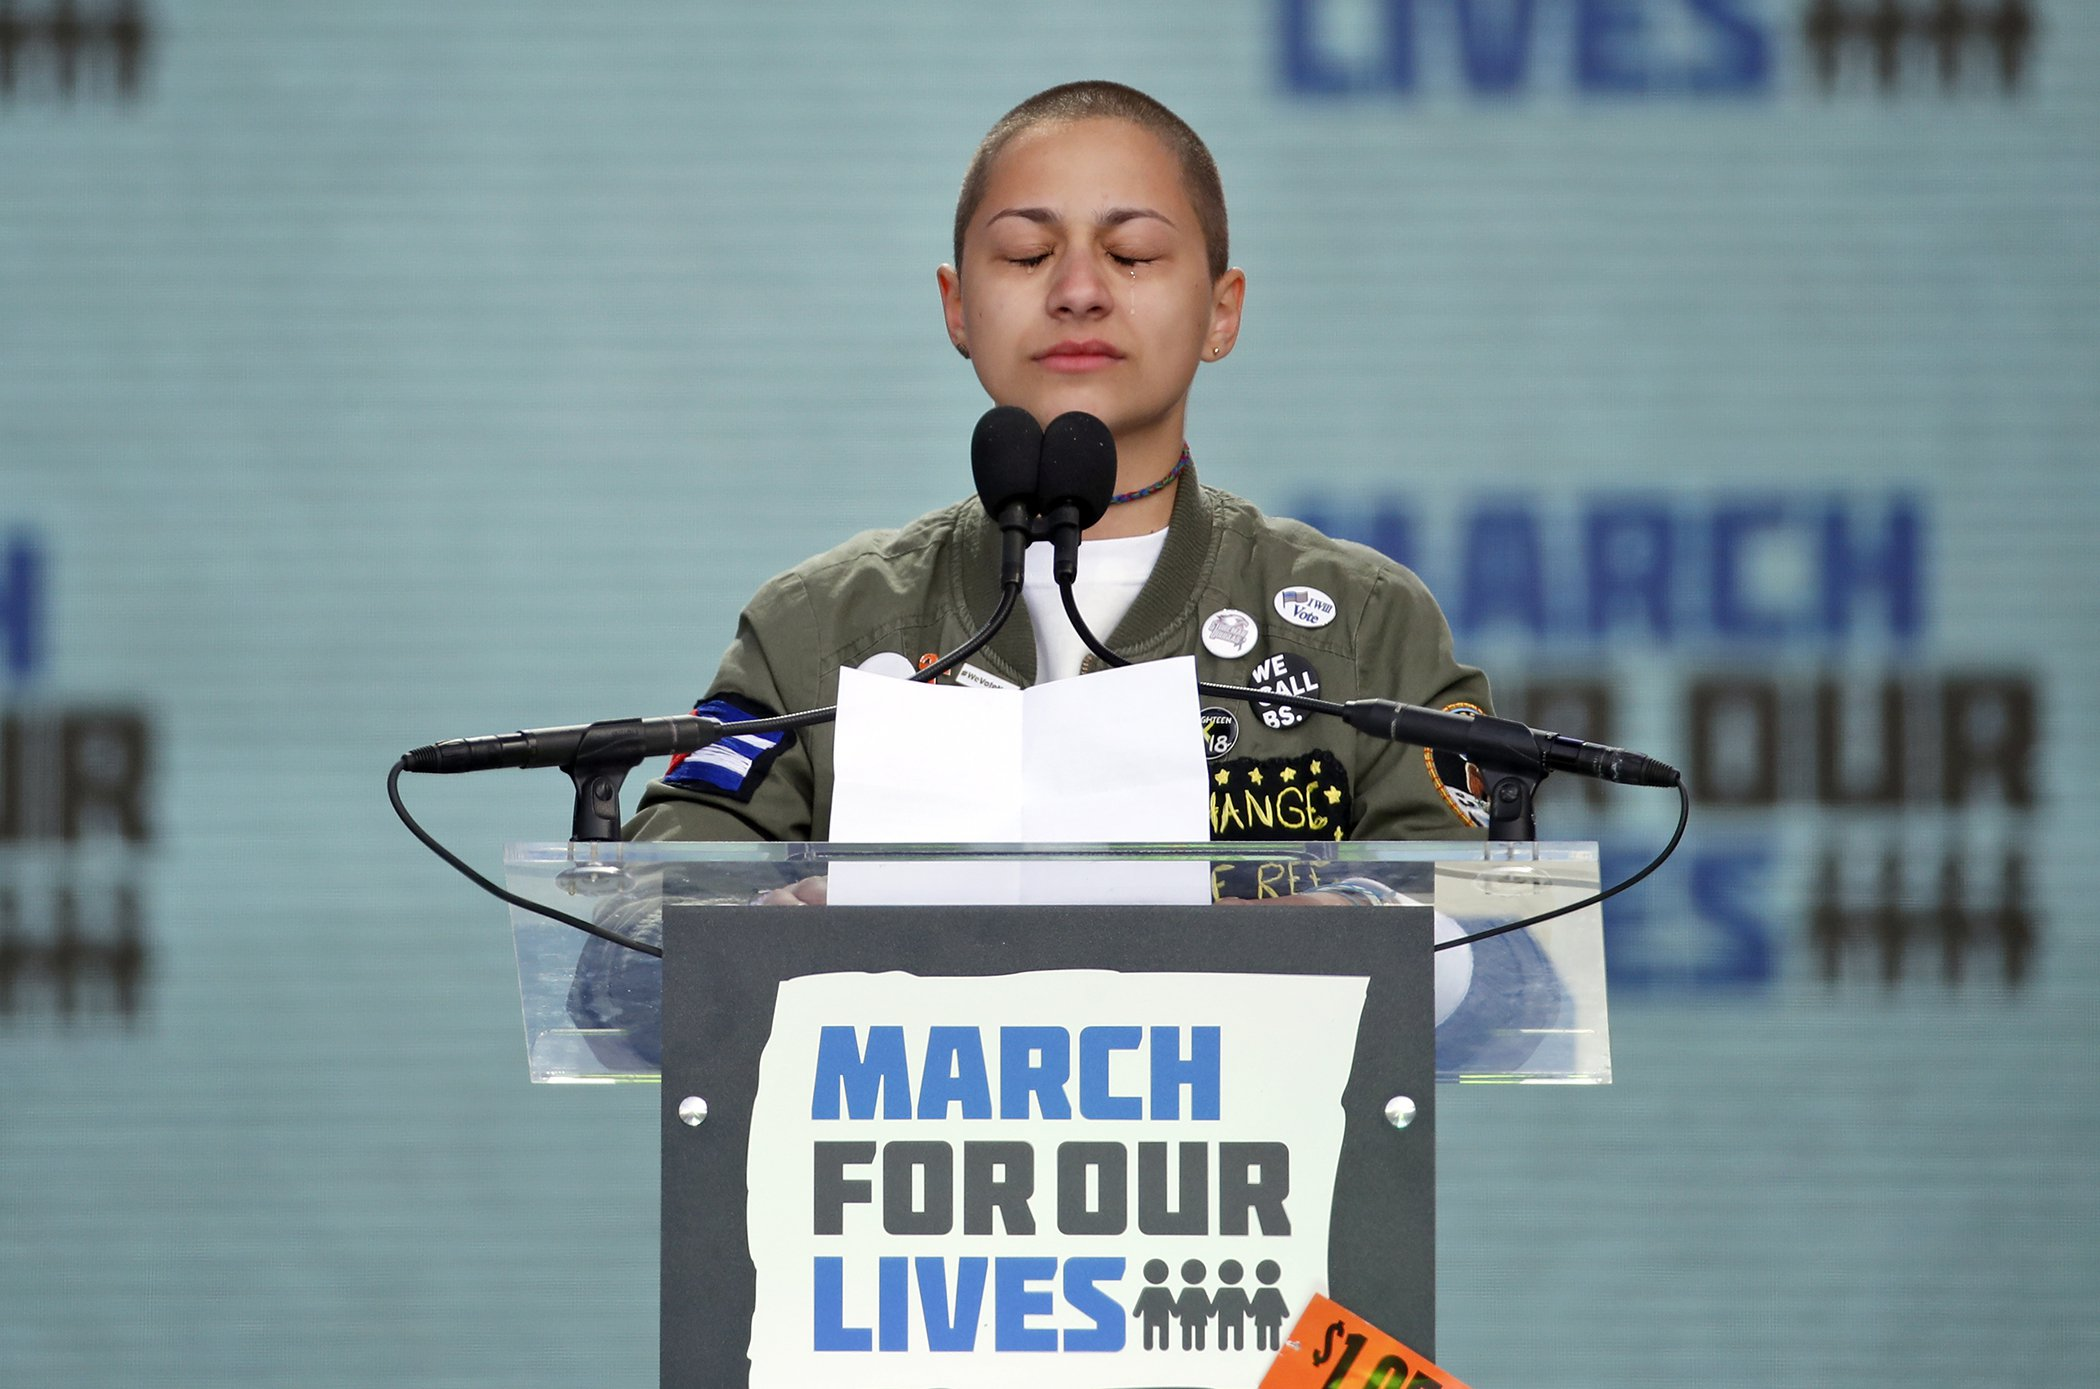 Emma-Gonzalez-Young-Activists.jpg